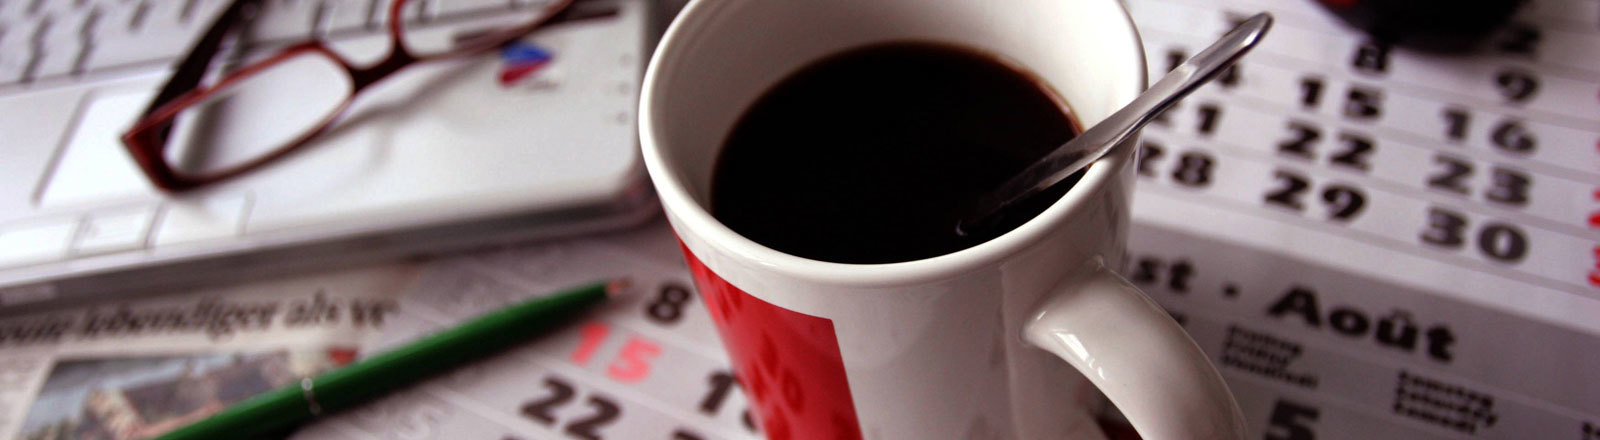 Kaffeetasse Kalender Maus Laptop Arbeitsplatz